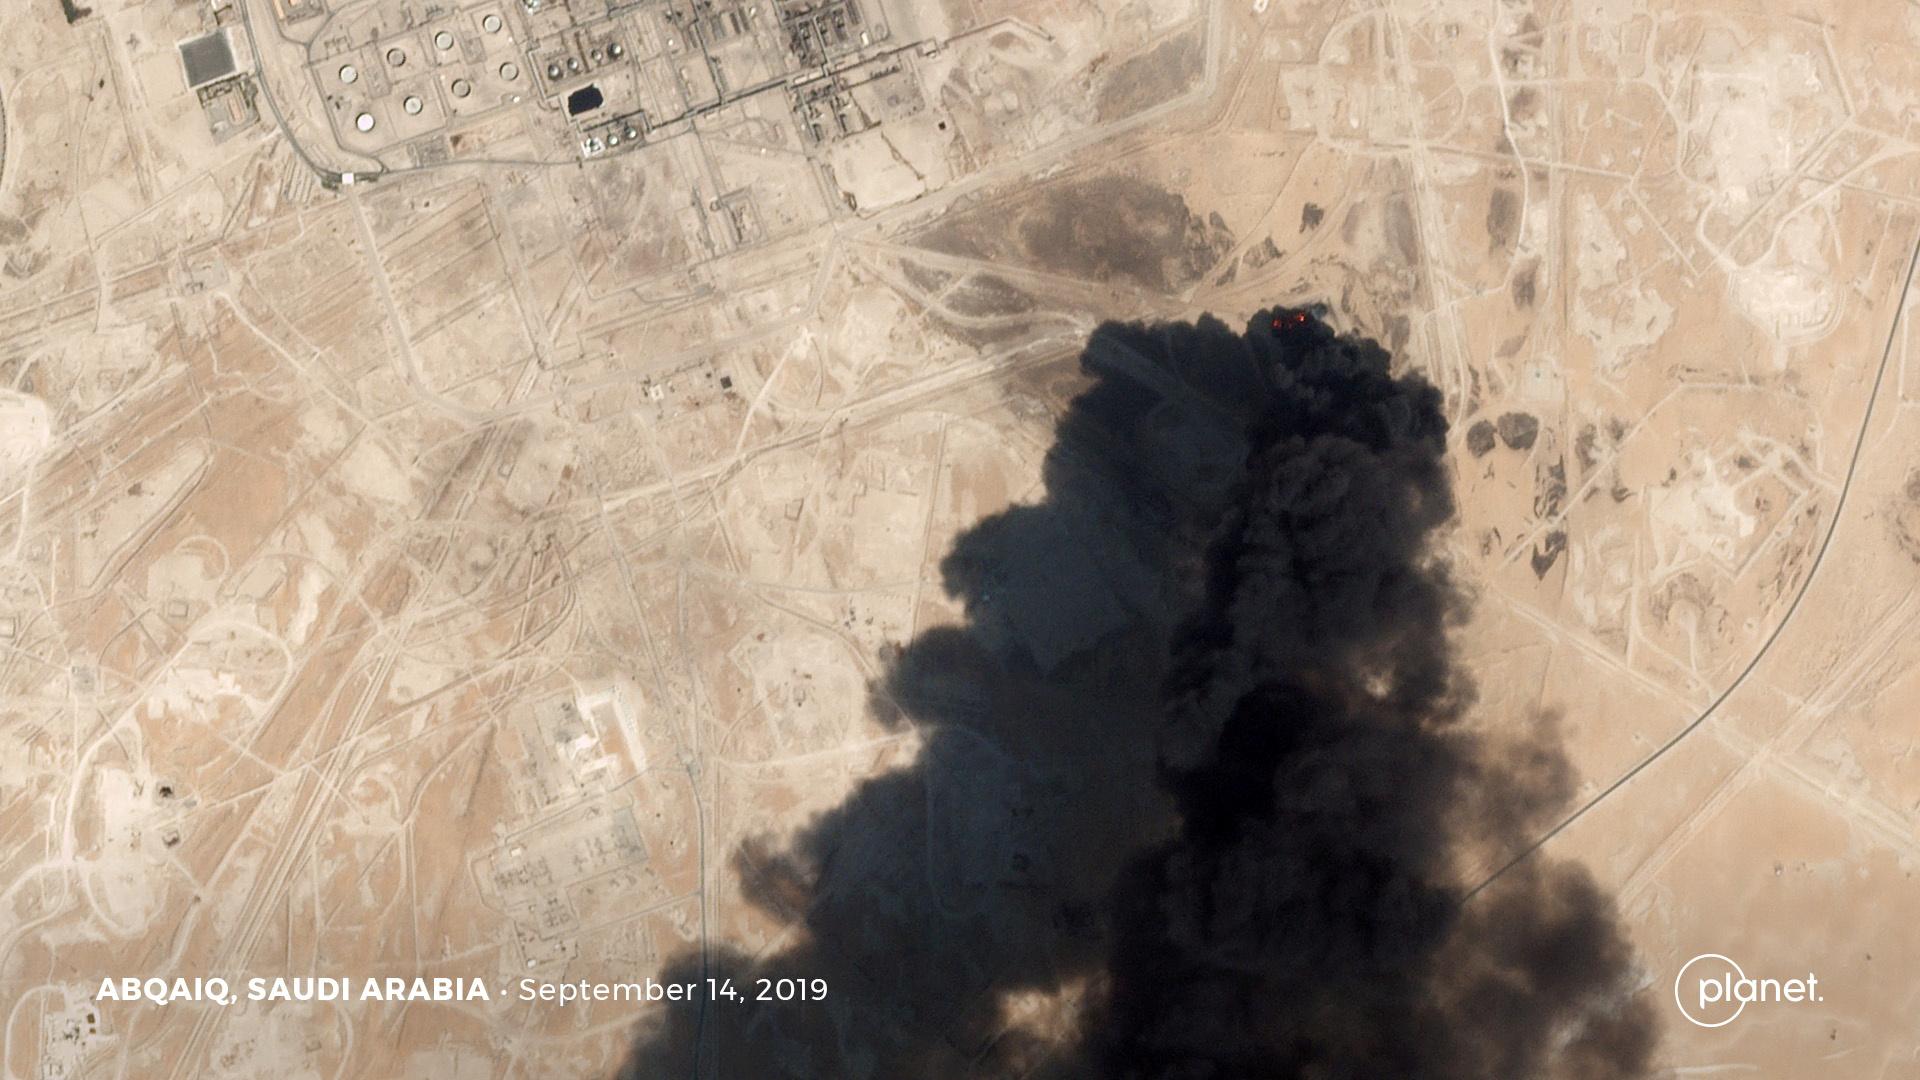 Resultado de imagen para petroleo arabia saudita